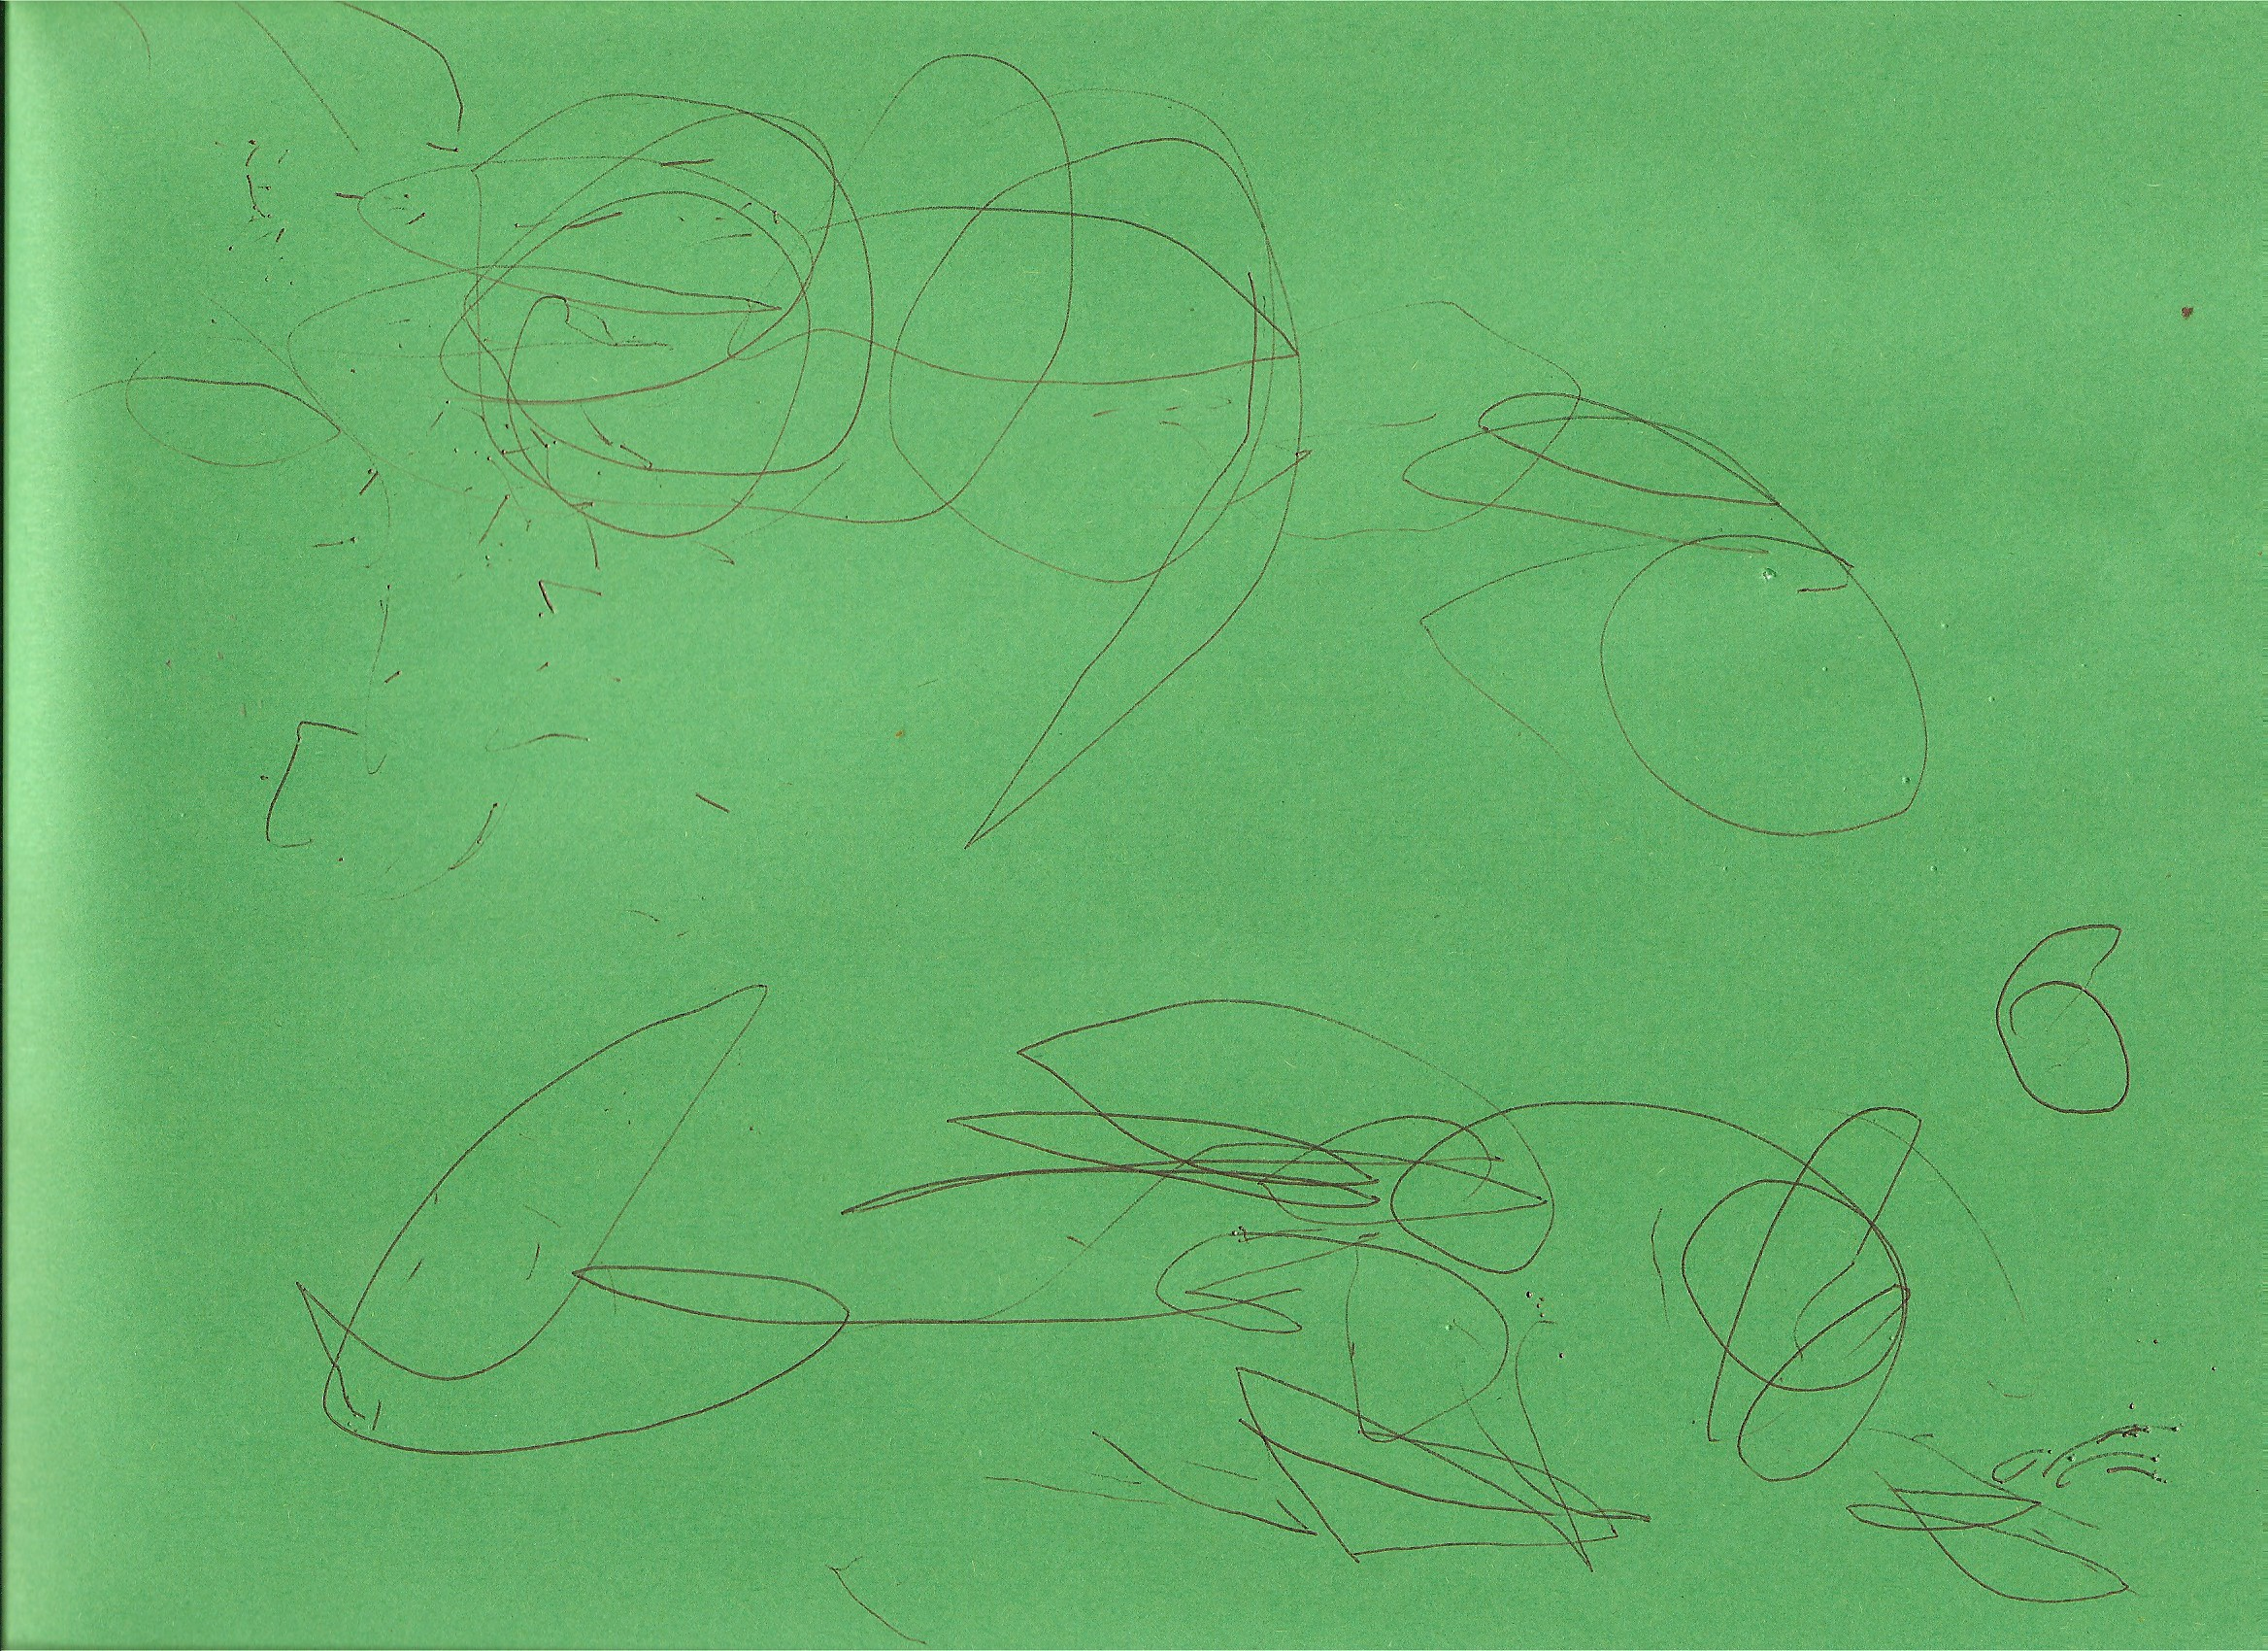 2008-10-25-carter-pen-drawing-1.jpg